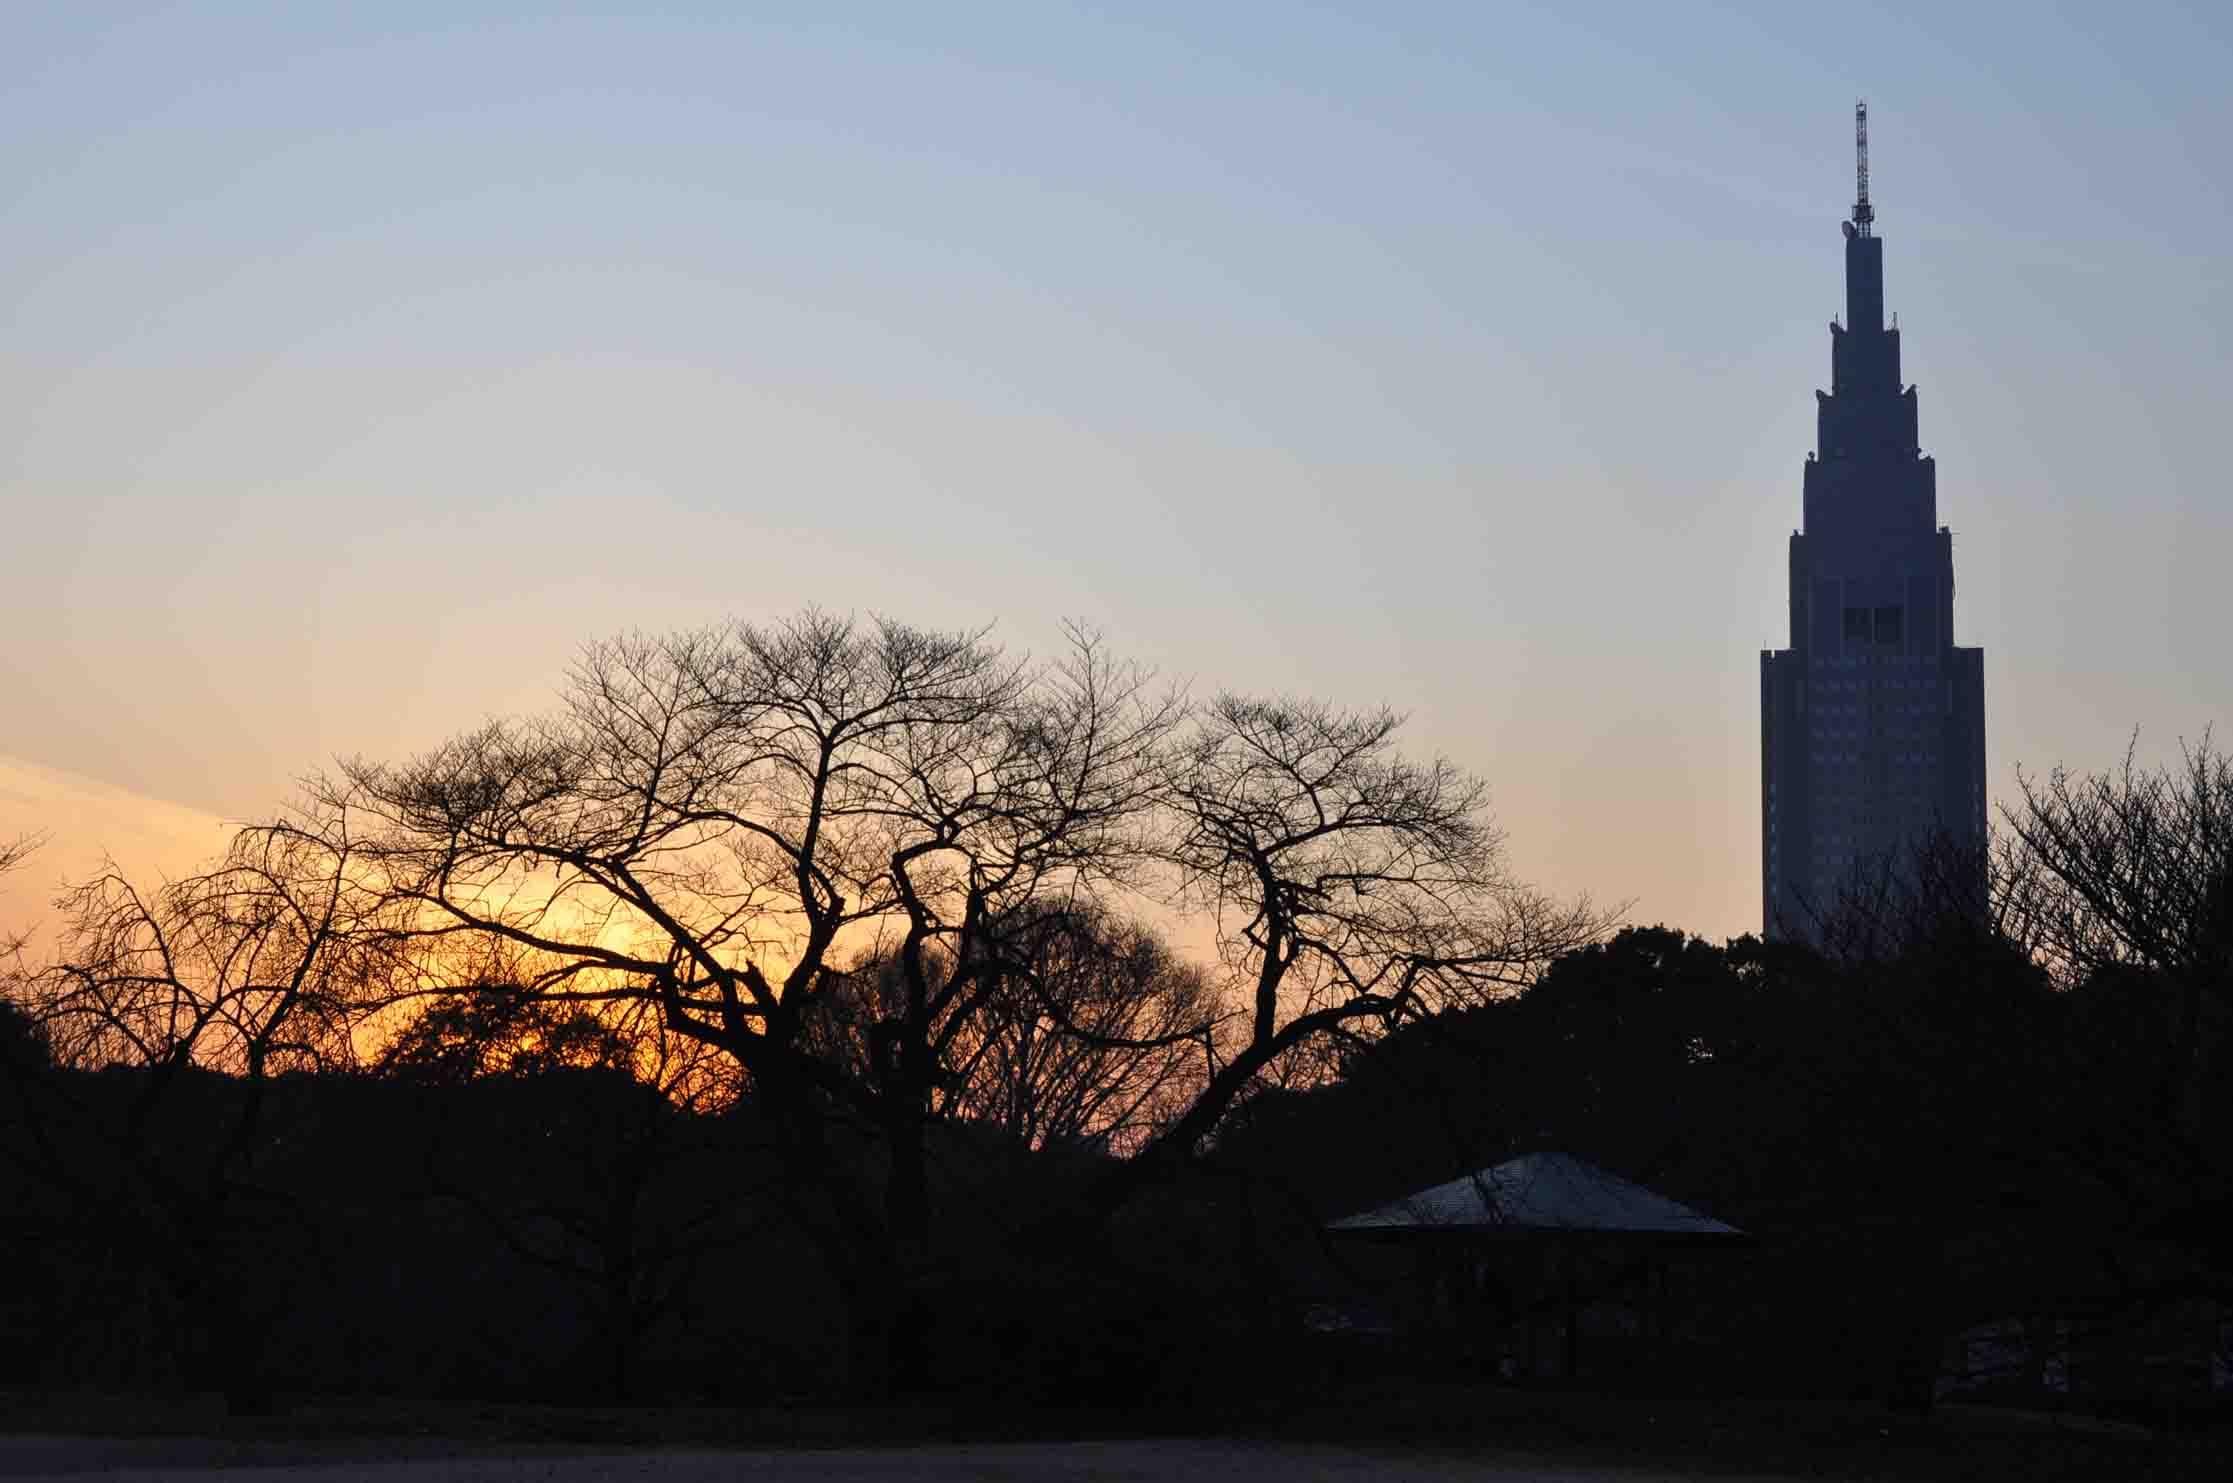 DSC_2803A「塔と木立がシルエット」